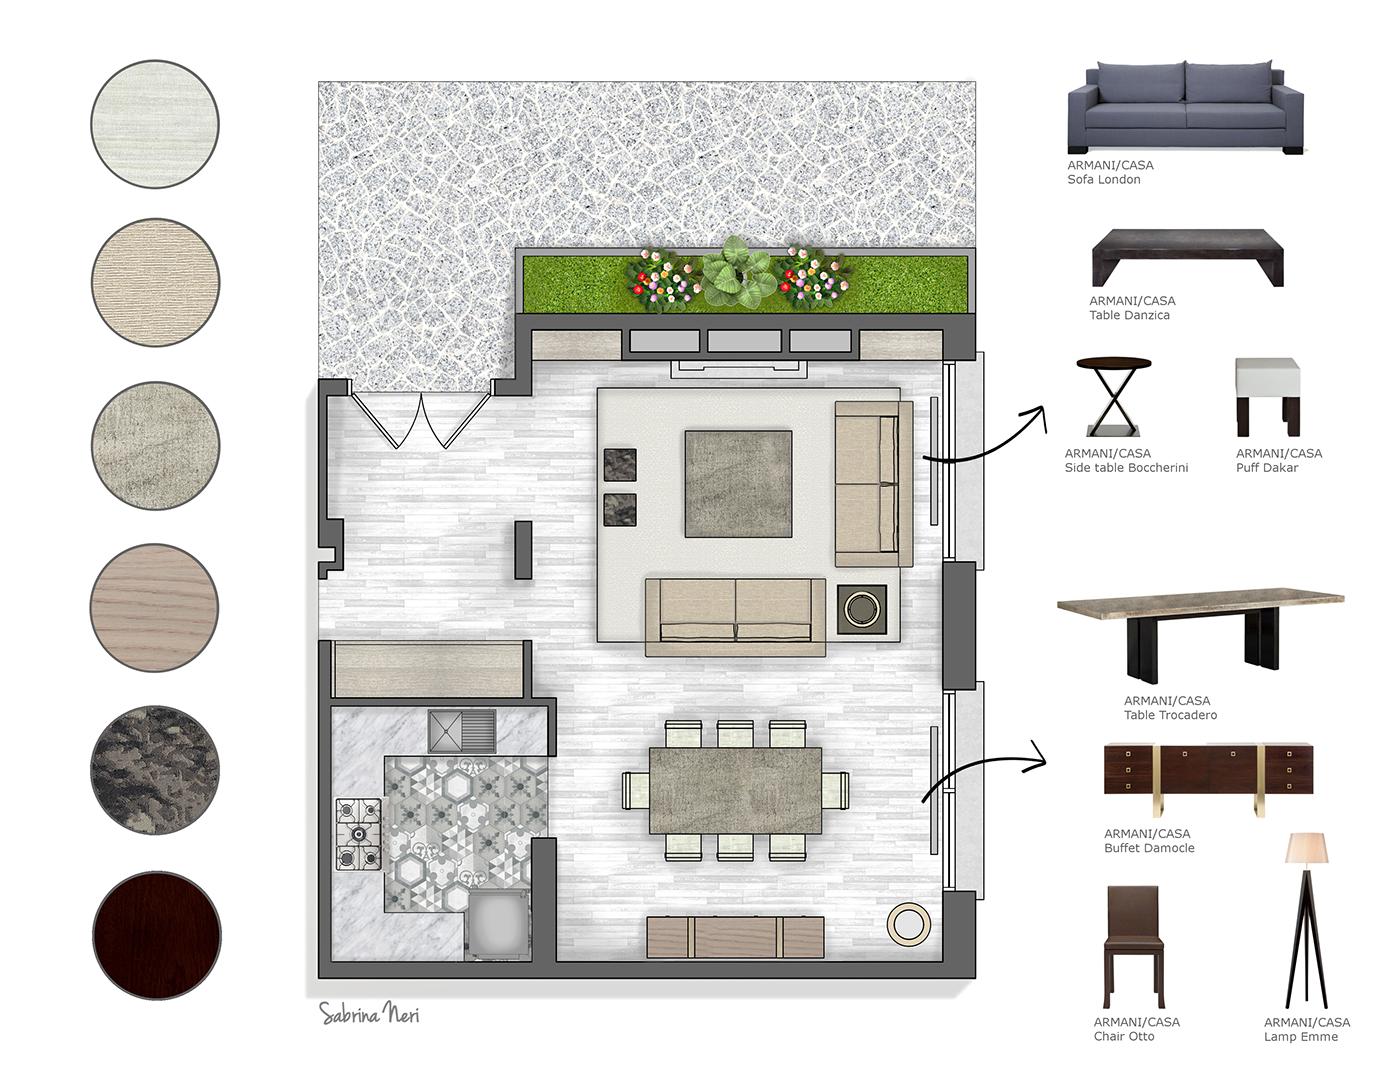 Project Armani/Casa Paris on Behance